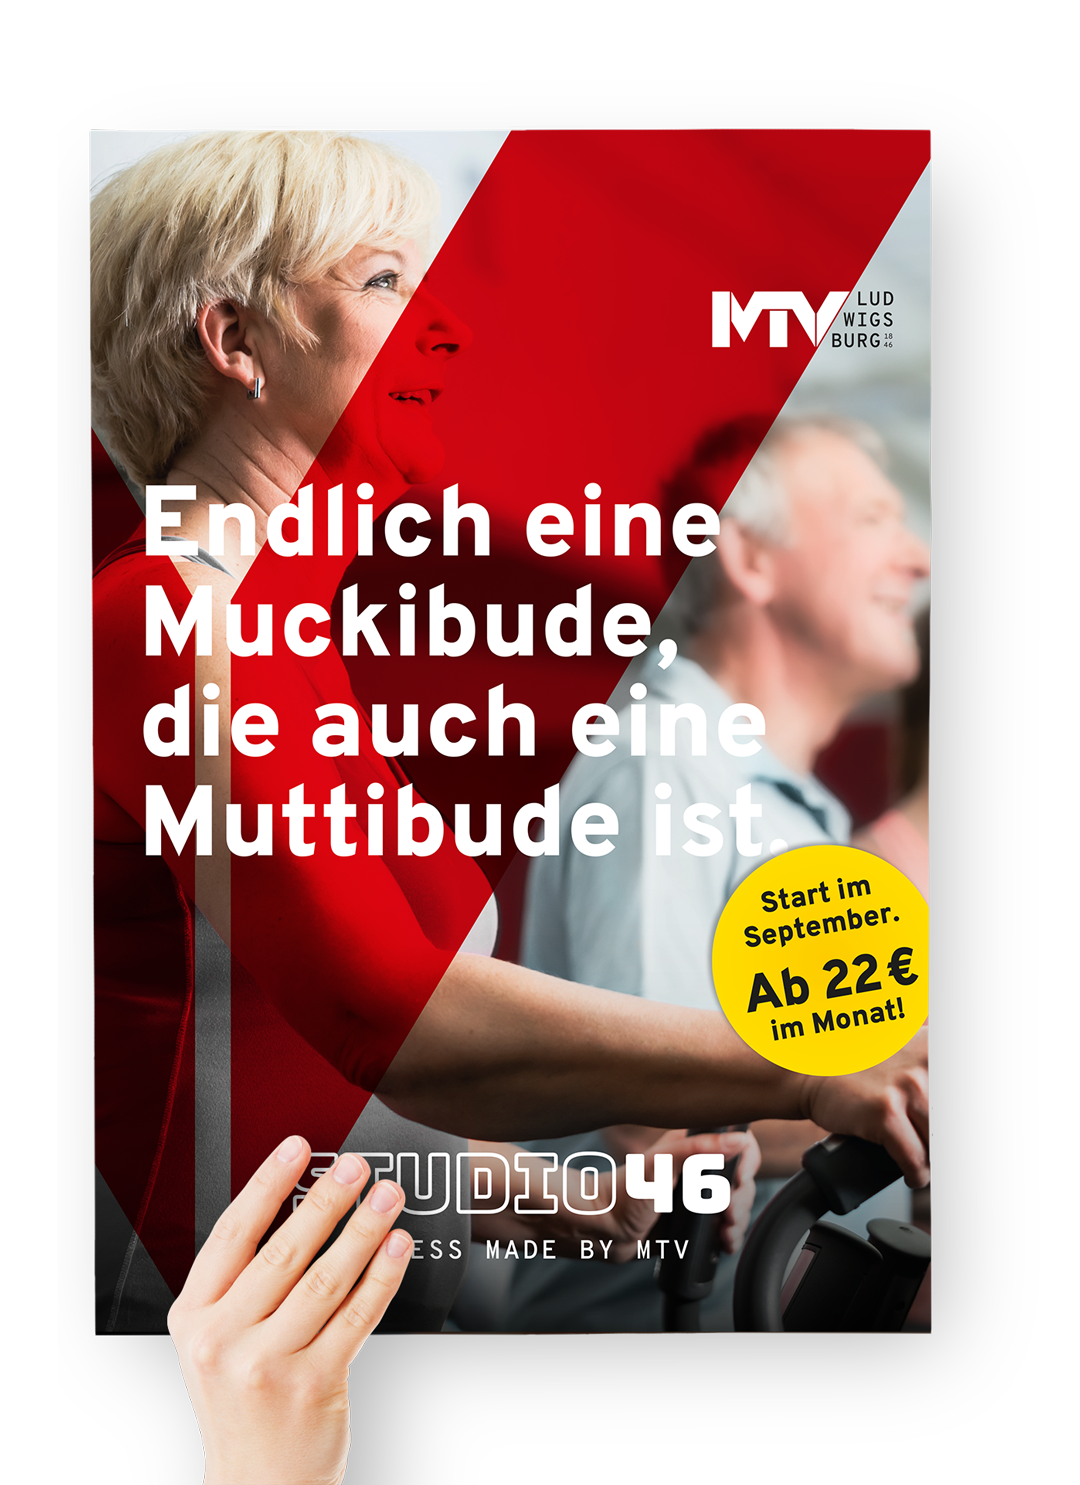 MTV Plakat – Studio46